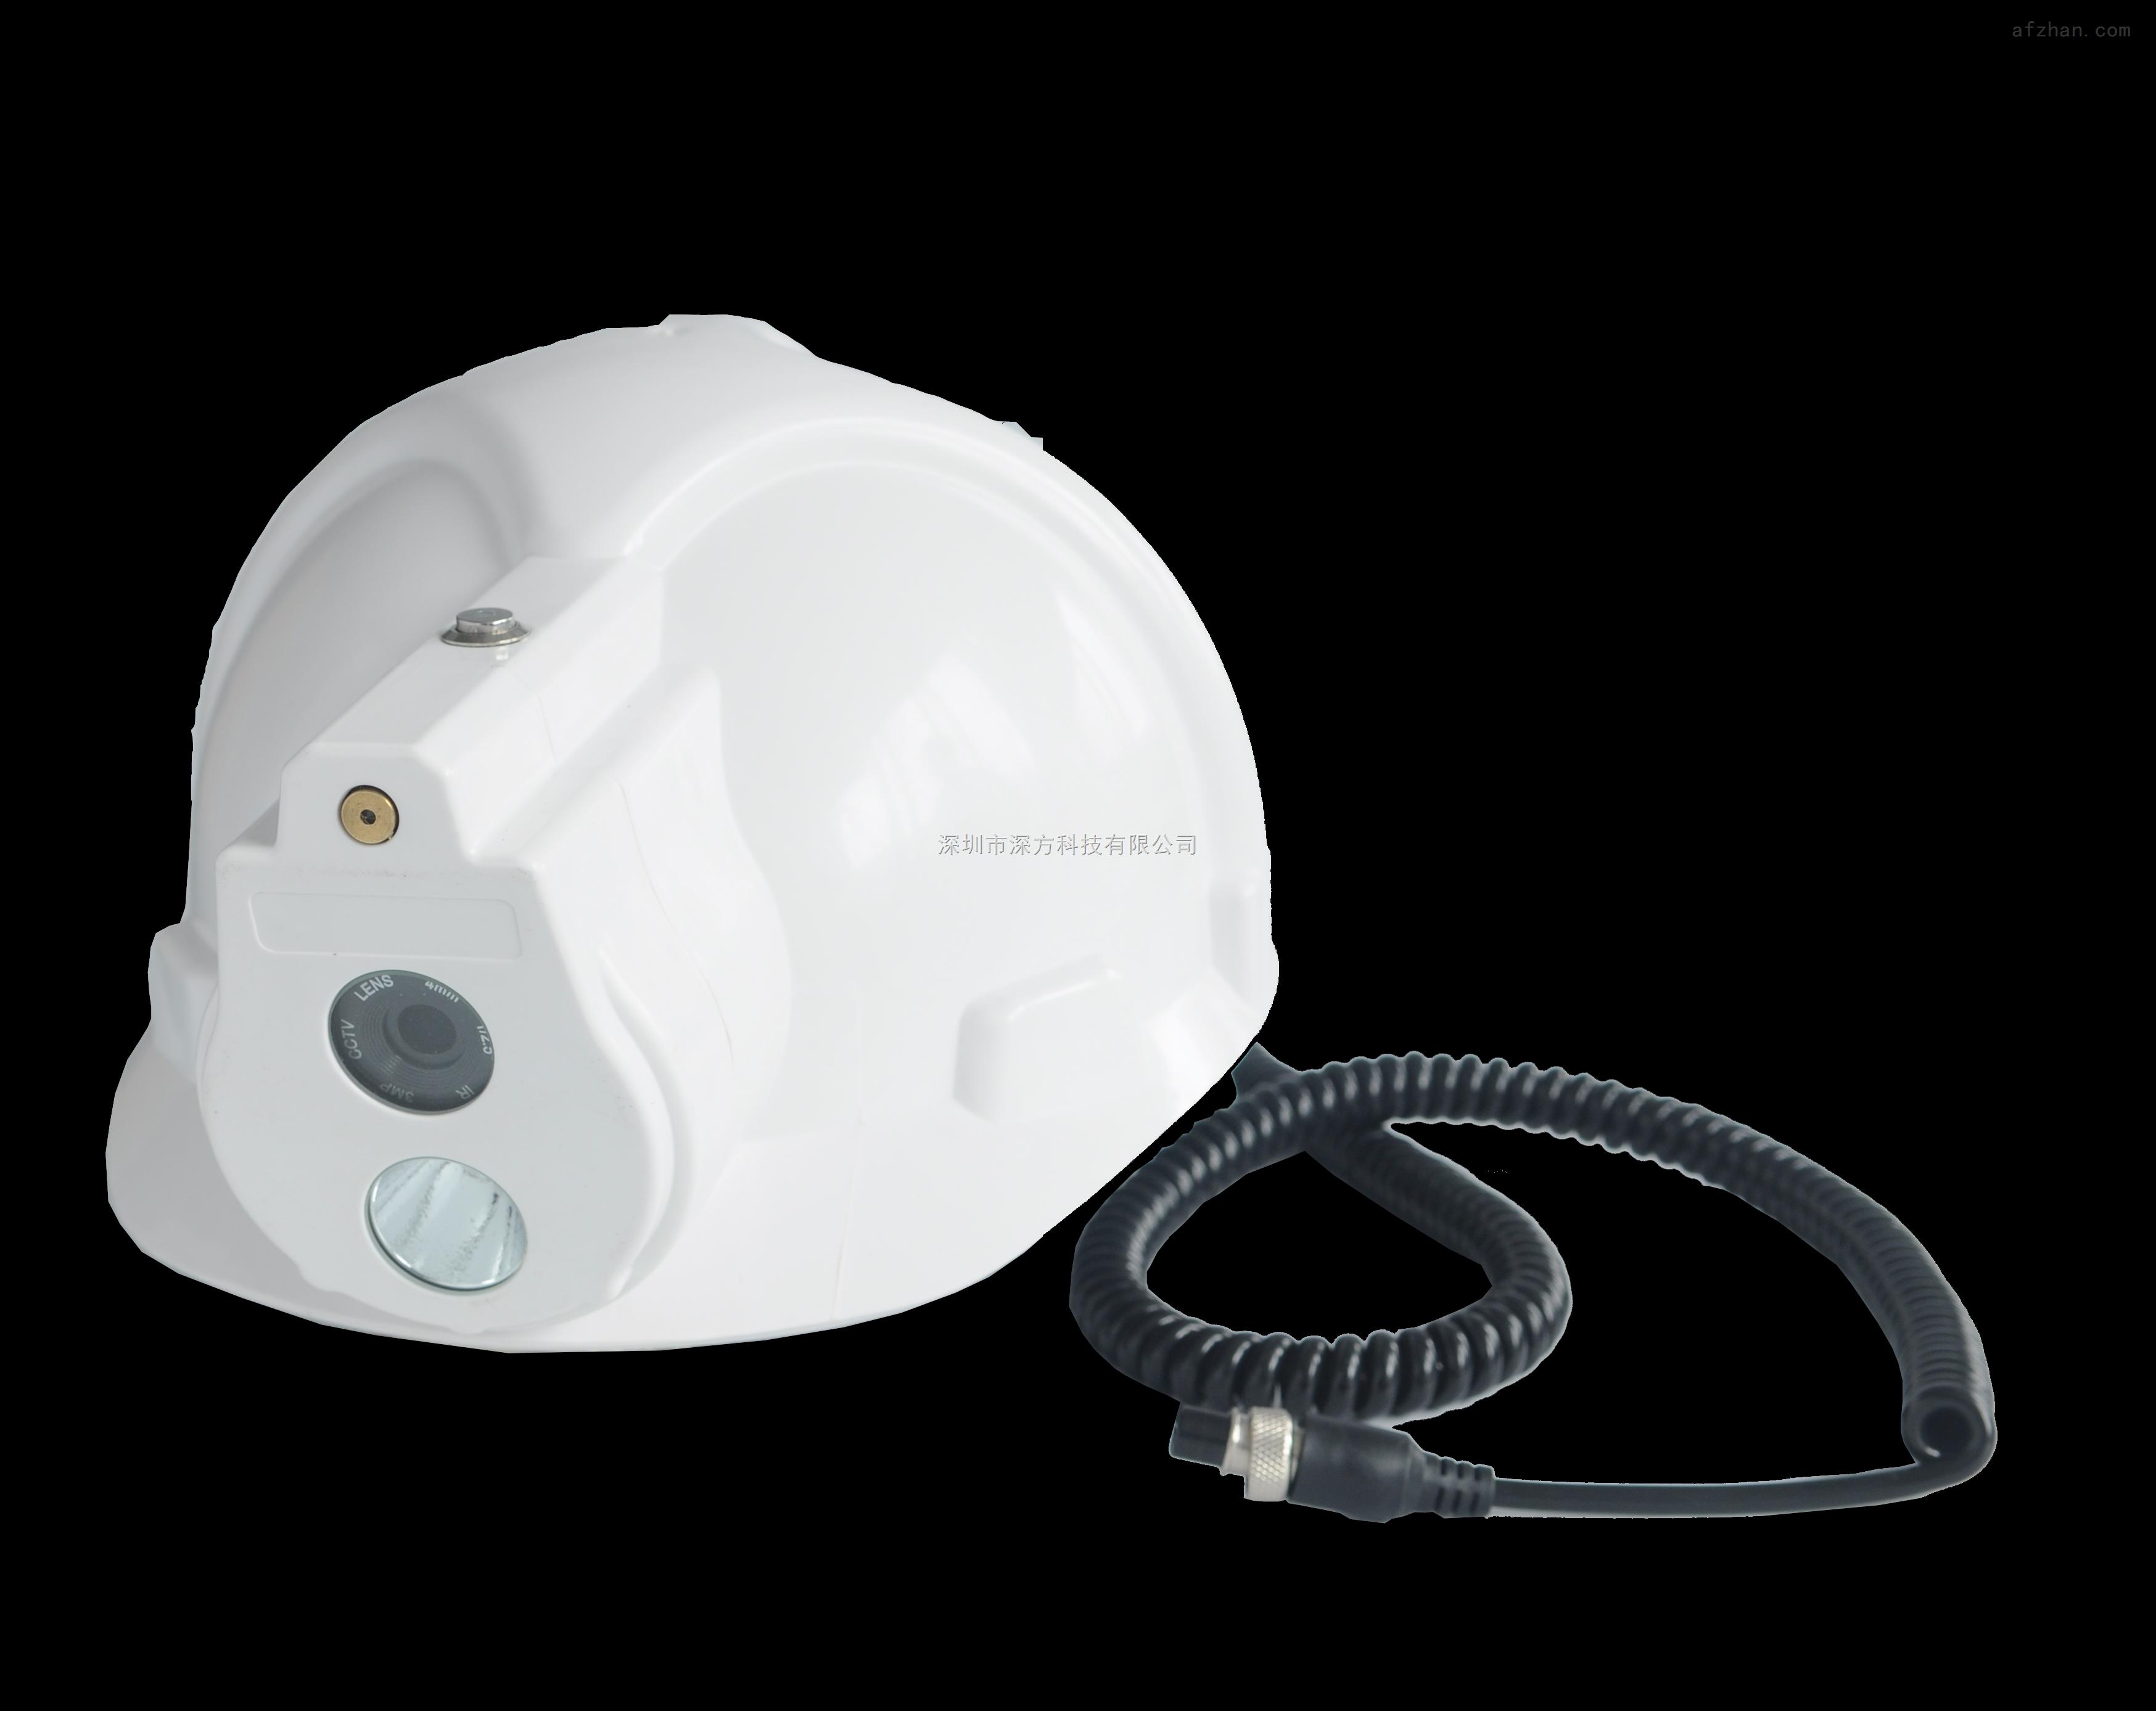 4G头盔,化工厂视频无线传输,4G头盔摄像头,头盔无线监控